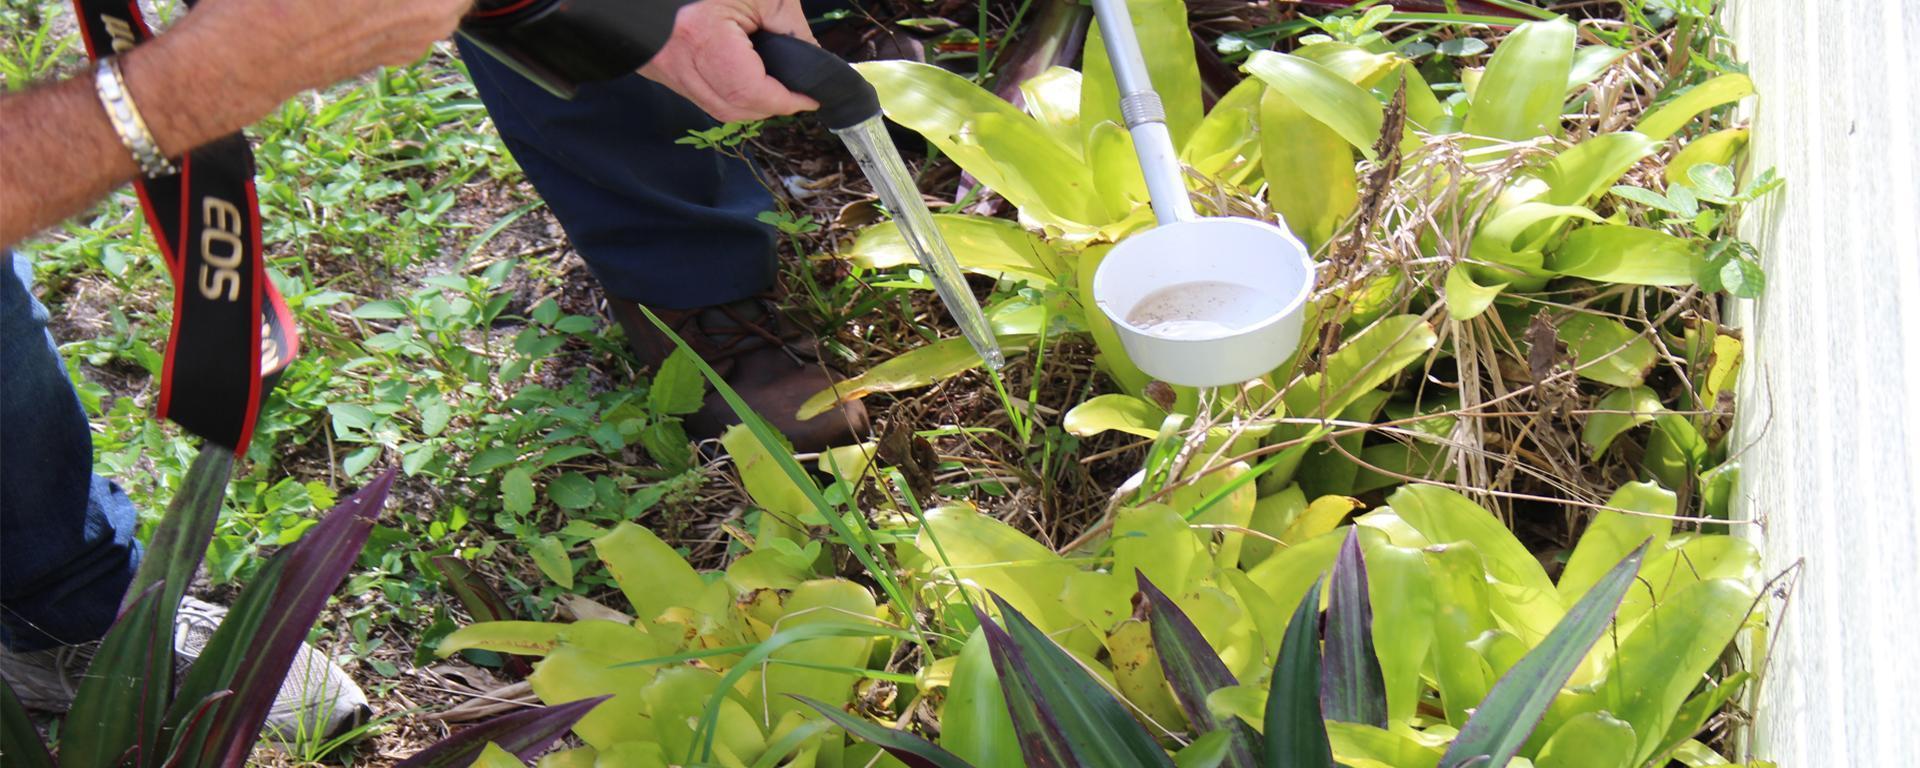 An image of Bromeliads